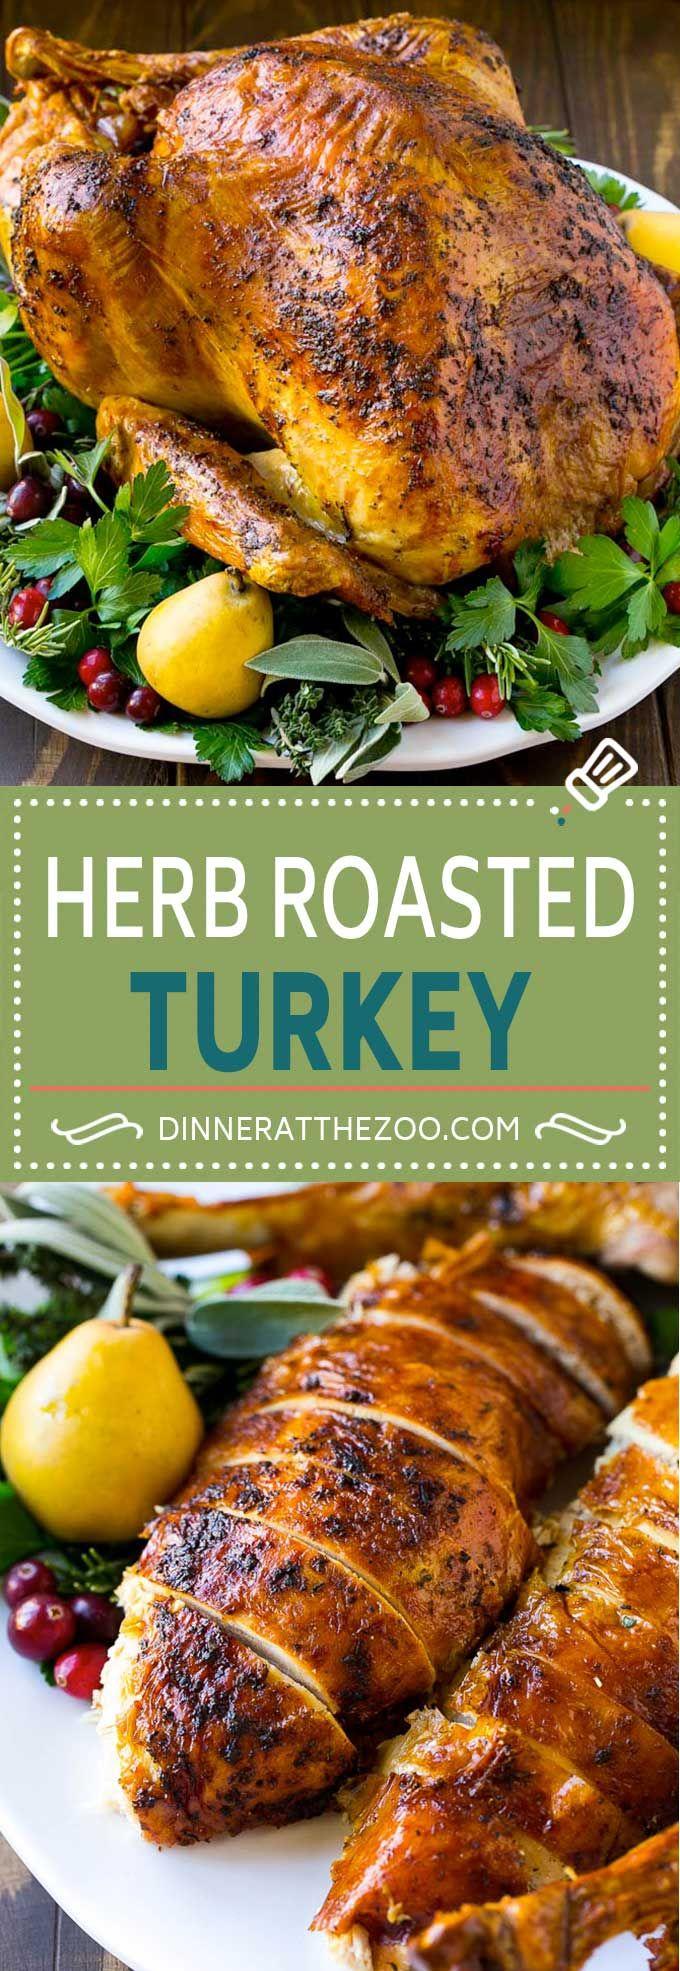 Herb Roasted Turkey Recipe | Baked Turkey | Thanksgiving Turkey | Christmas Turkey | Holiday Turkey Recipe | Butter Roasted Turkey Recipe